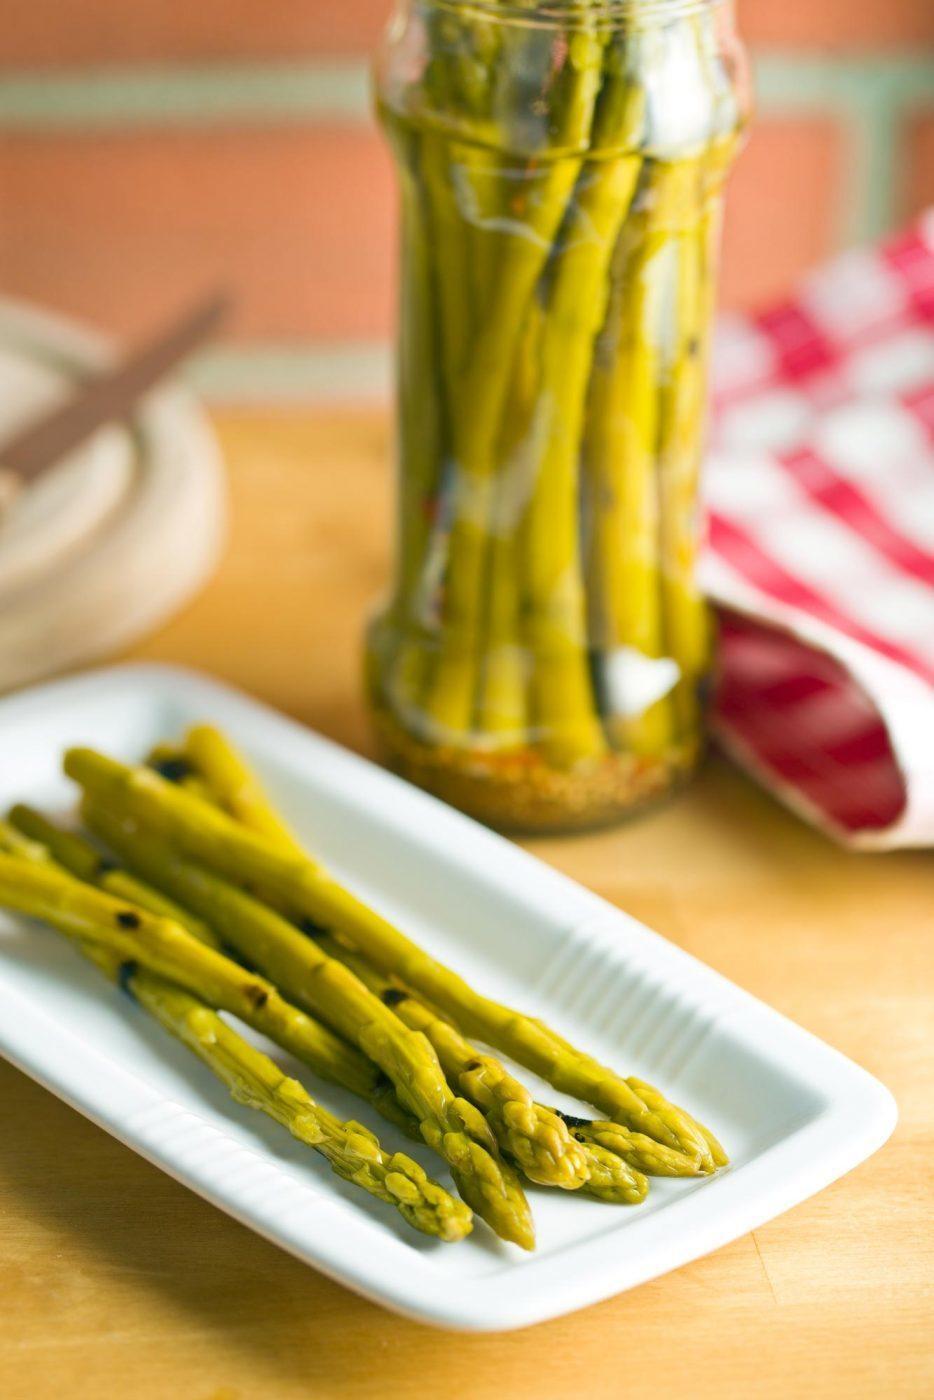 Jars of pickled asparagu.